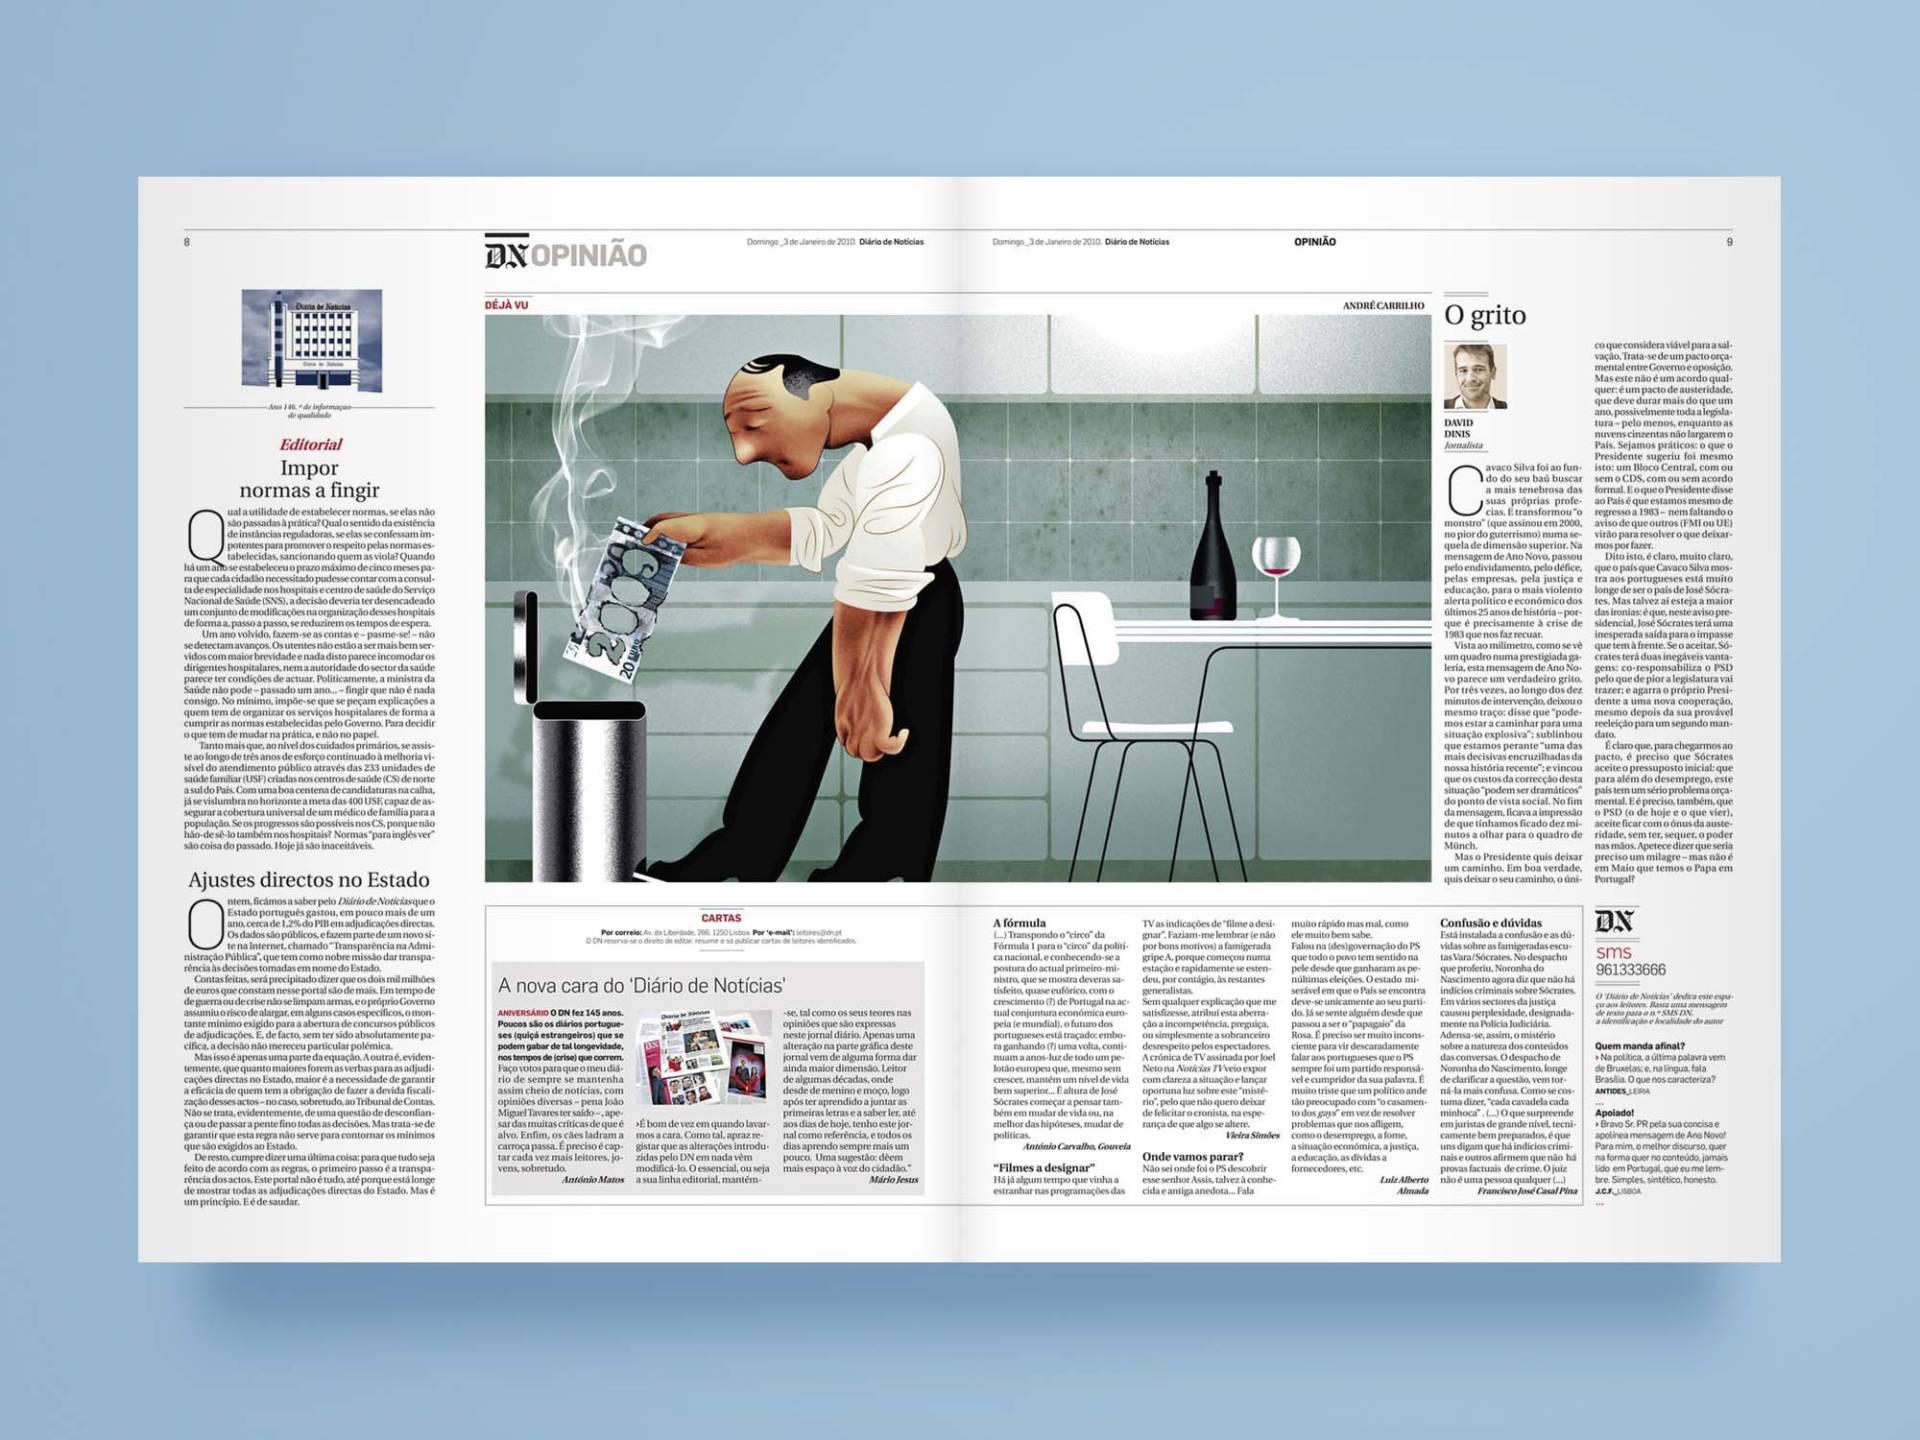 Diario_De_Noticias_03_Wenceslau_News_Design